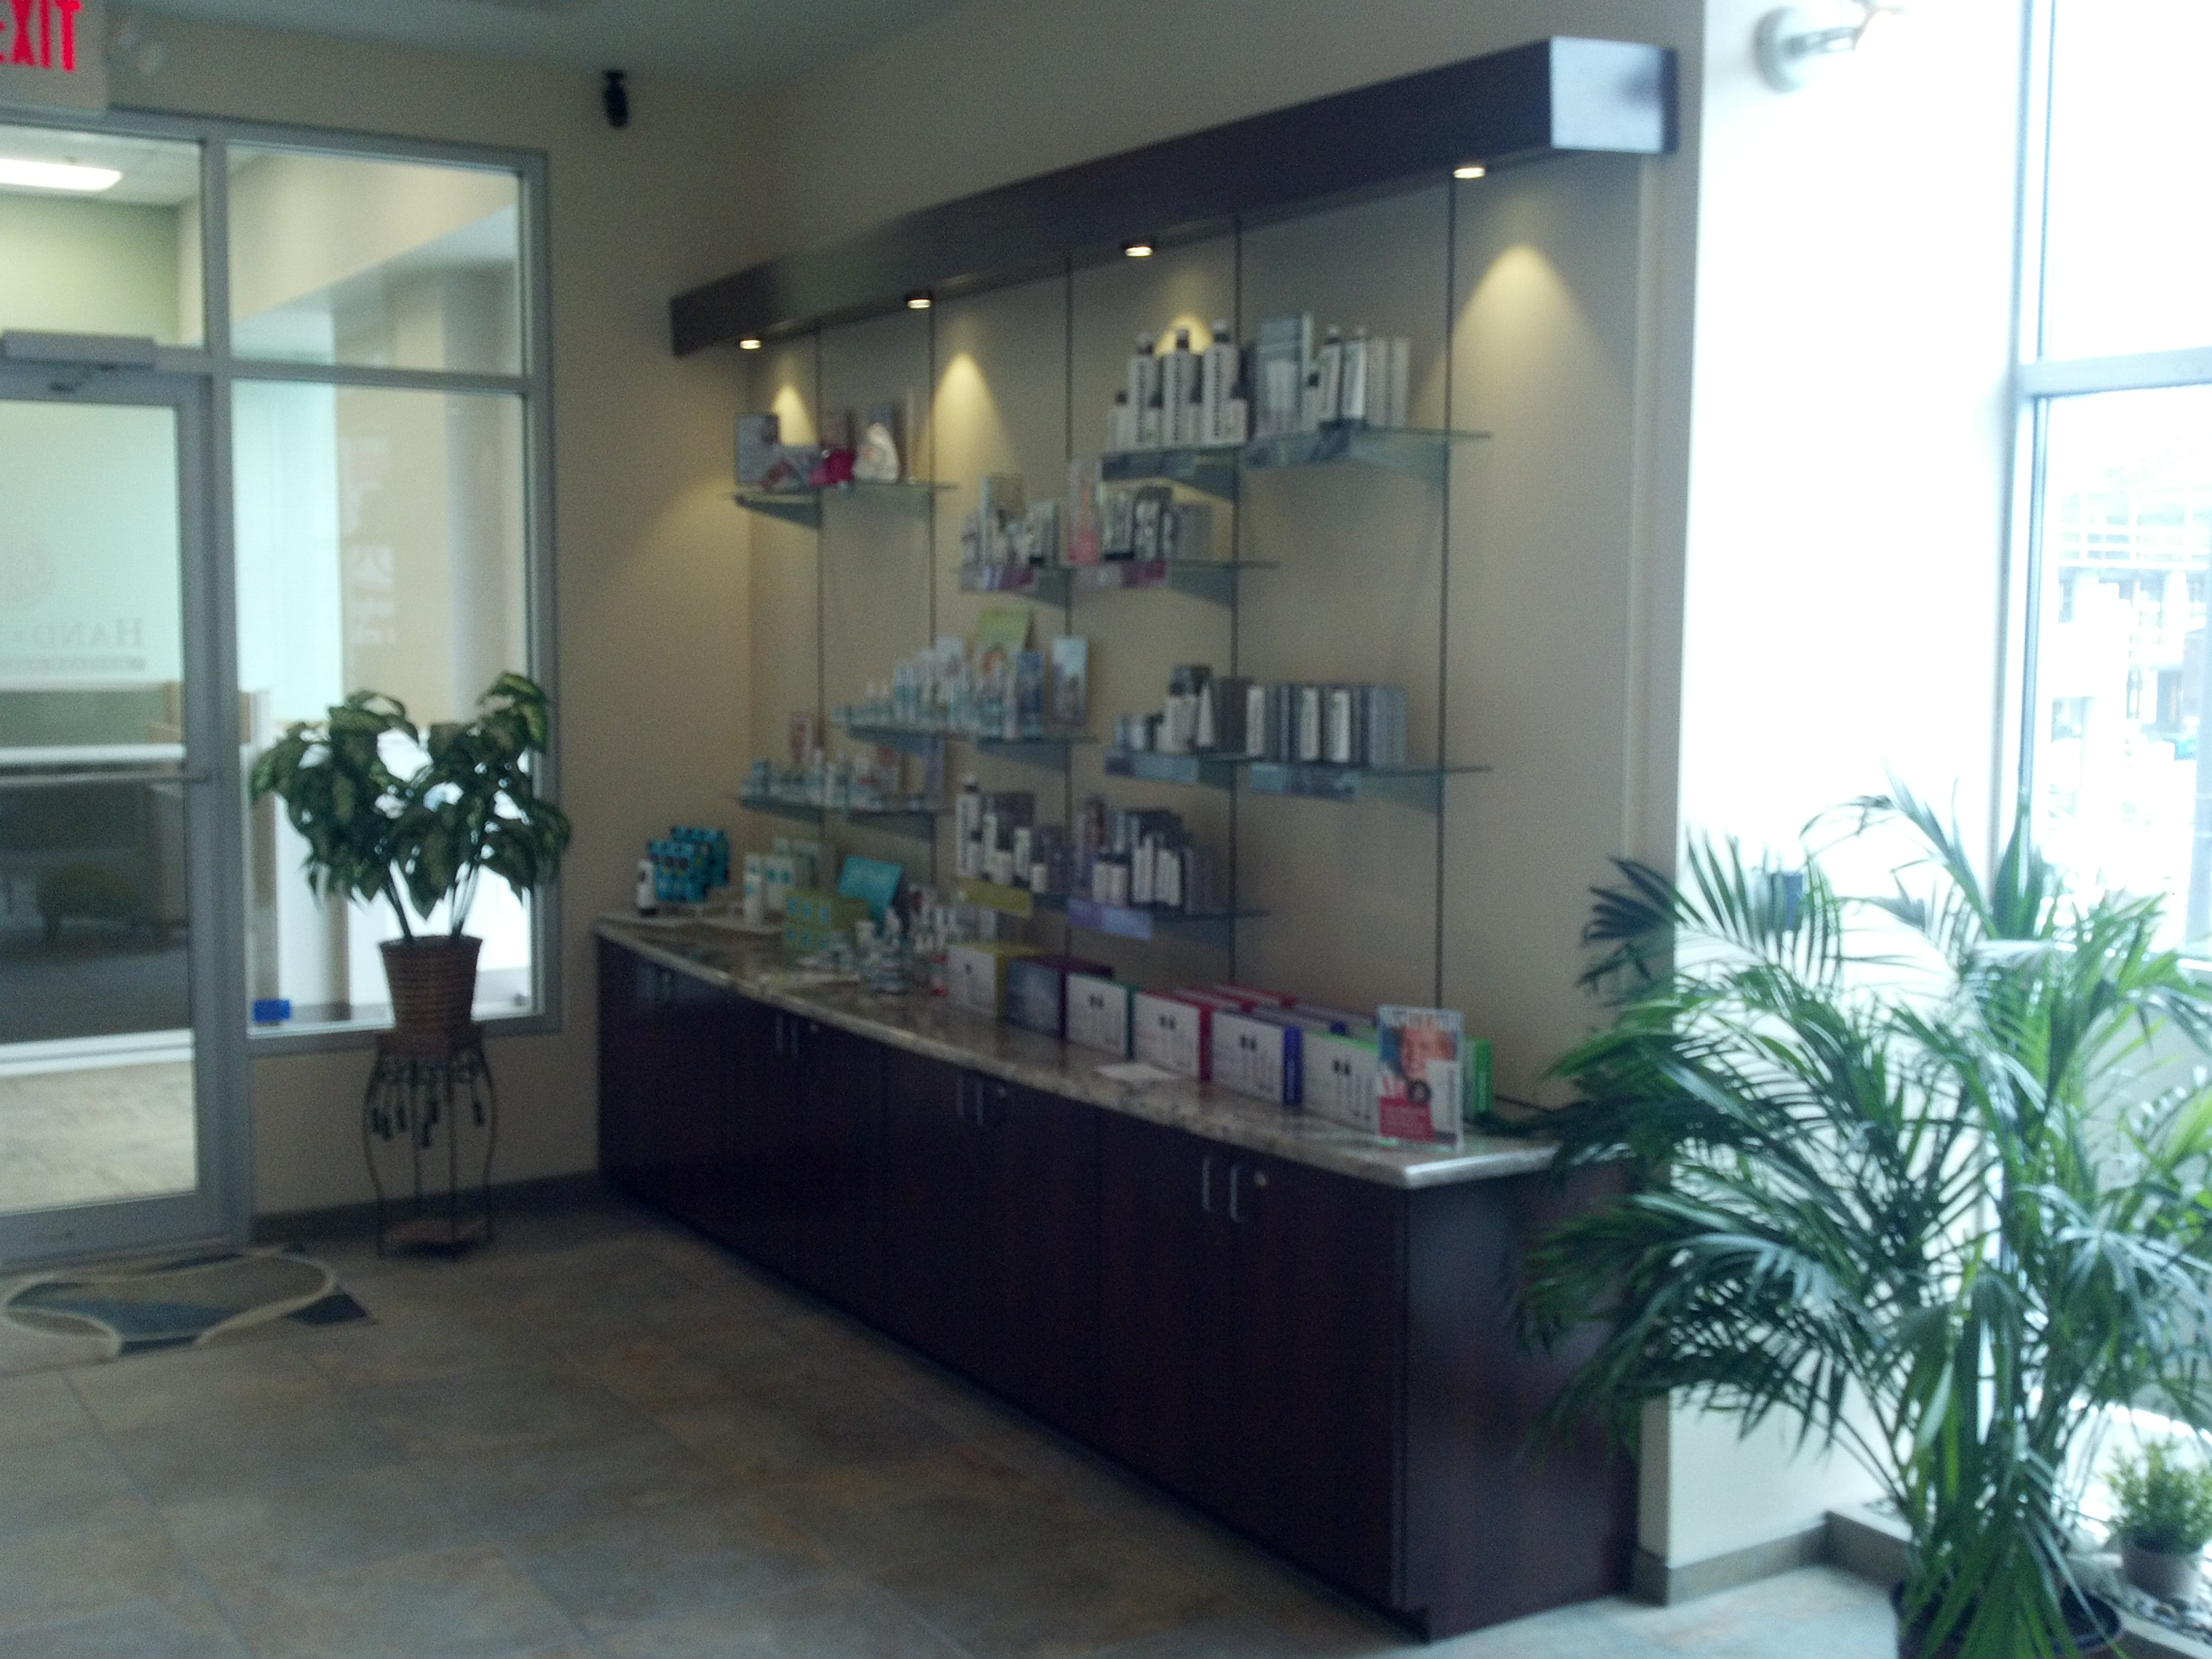 Hand & Stone Massage and Facial Spa, Logan Square